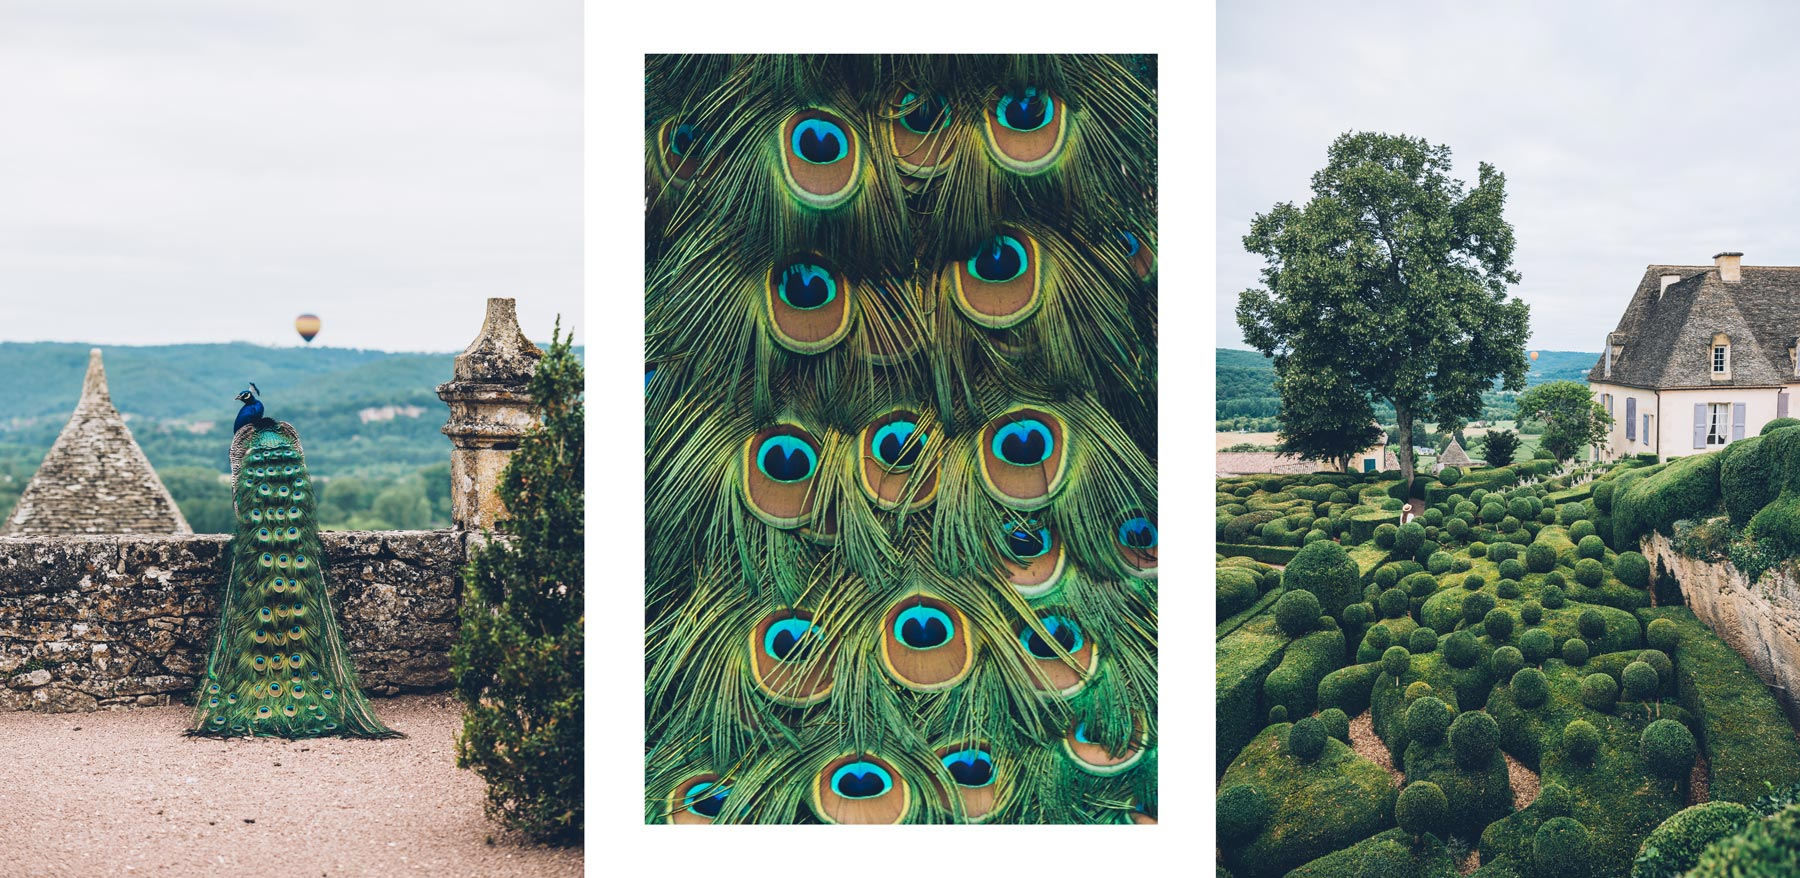 Le beau jardin de Marqueyssac